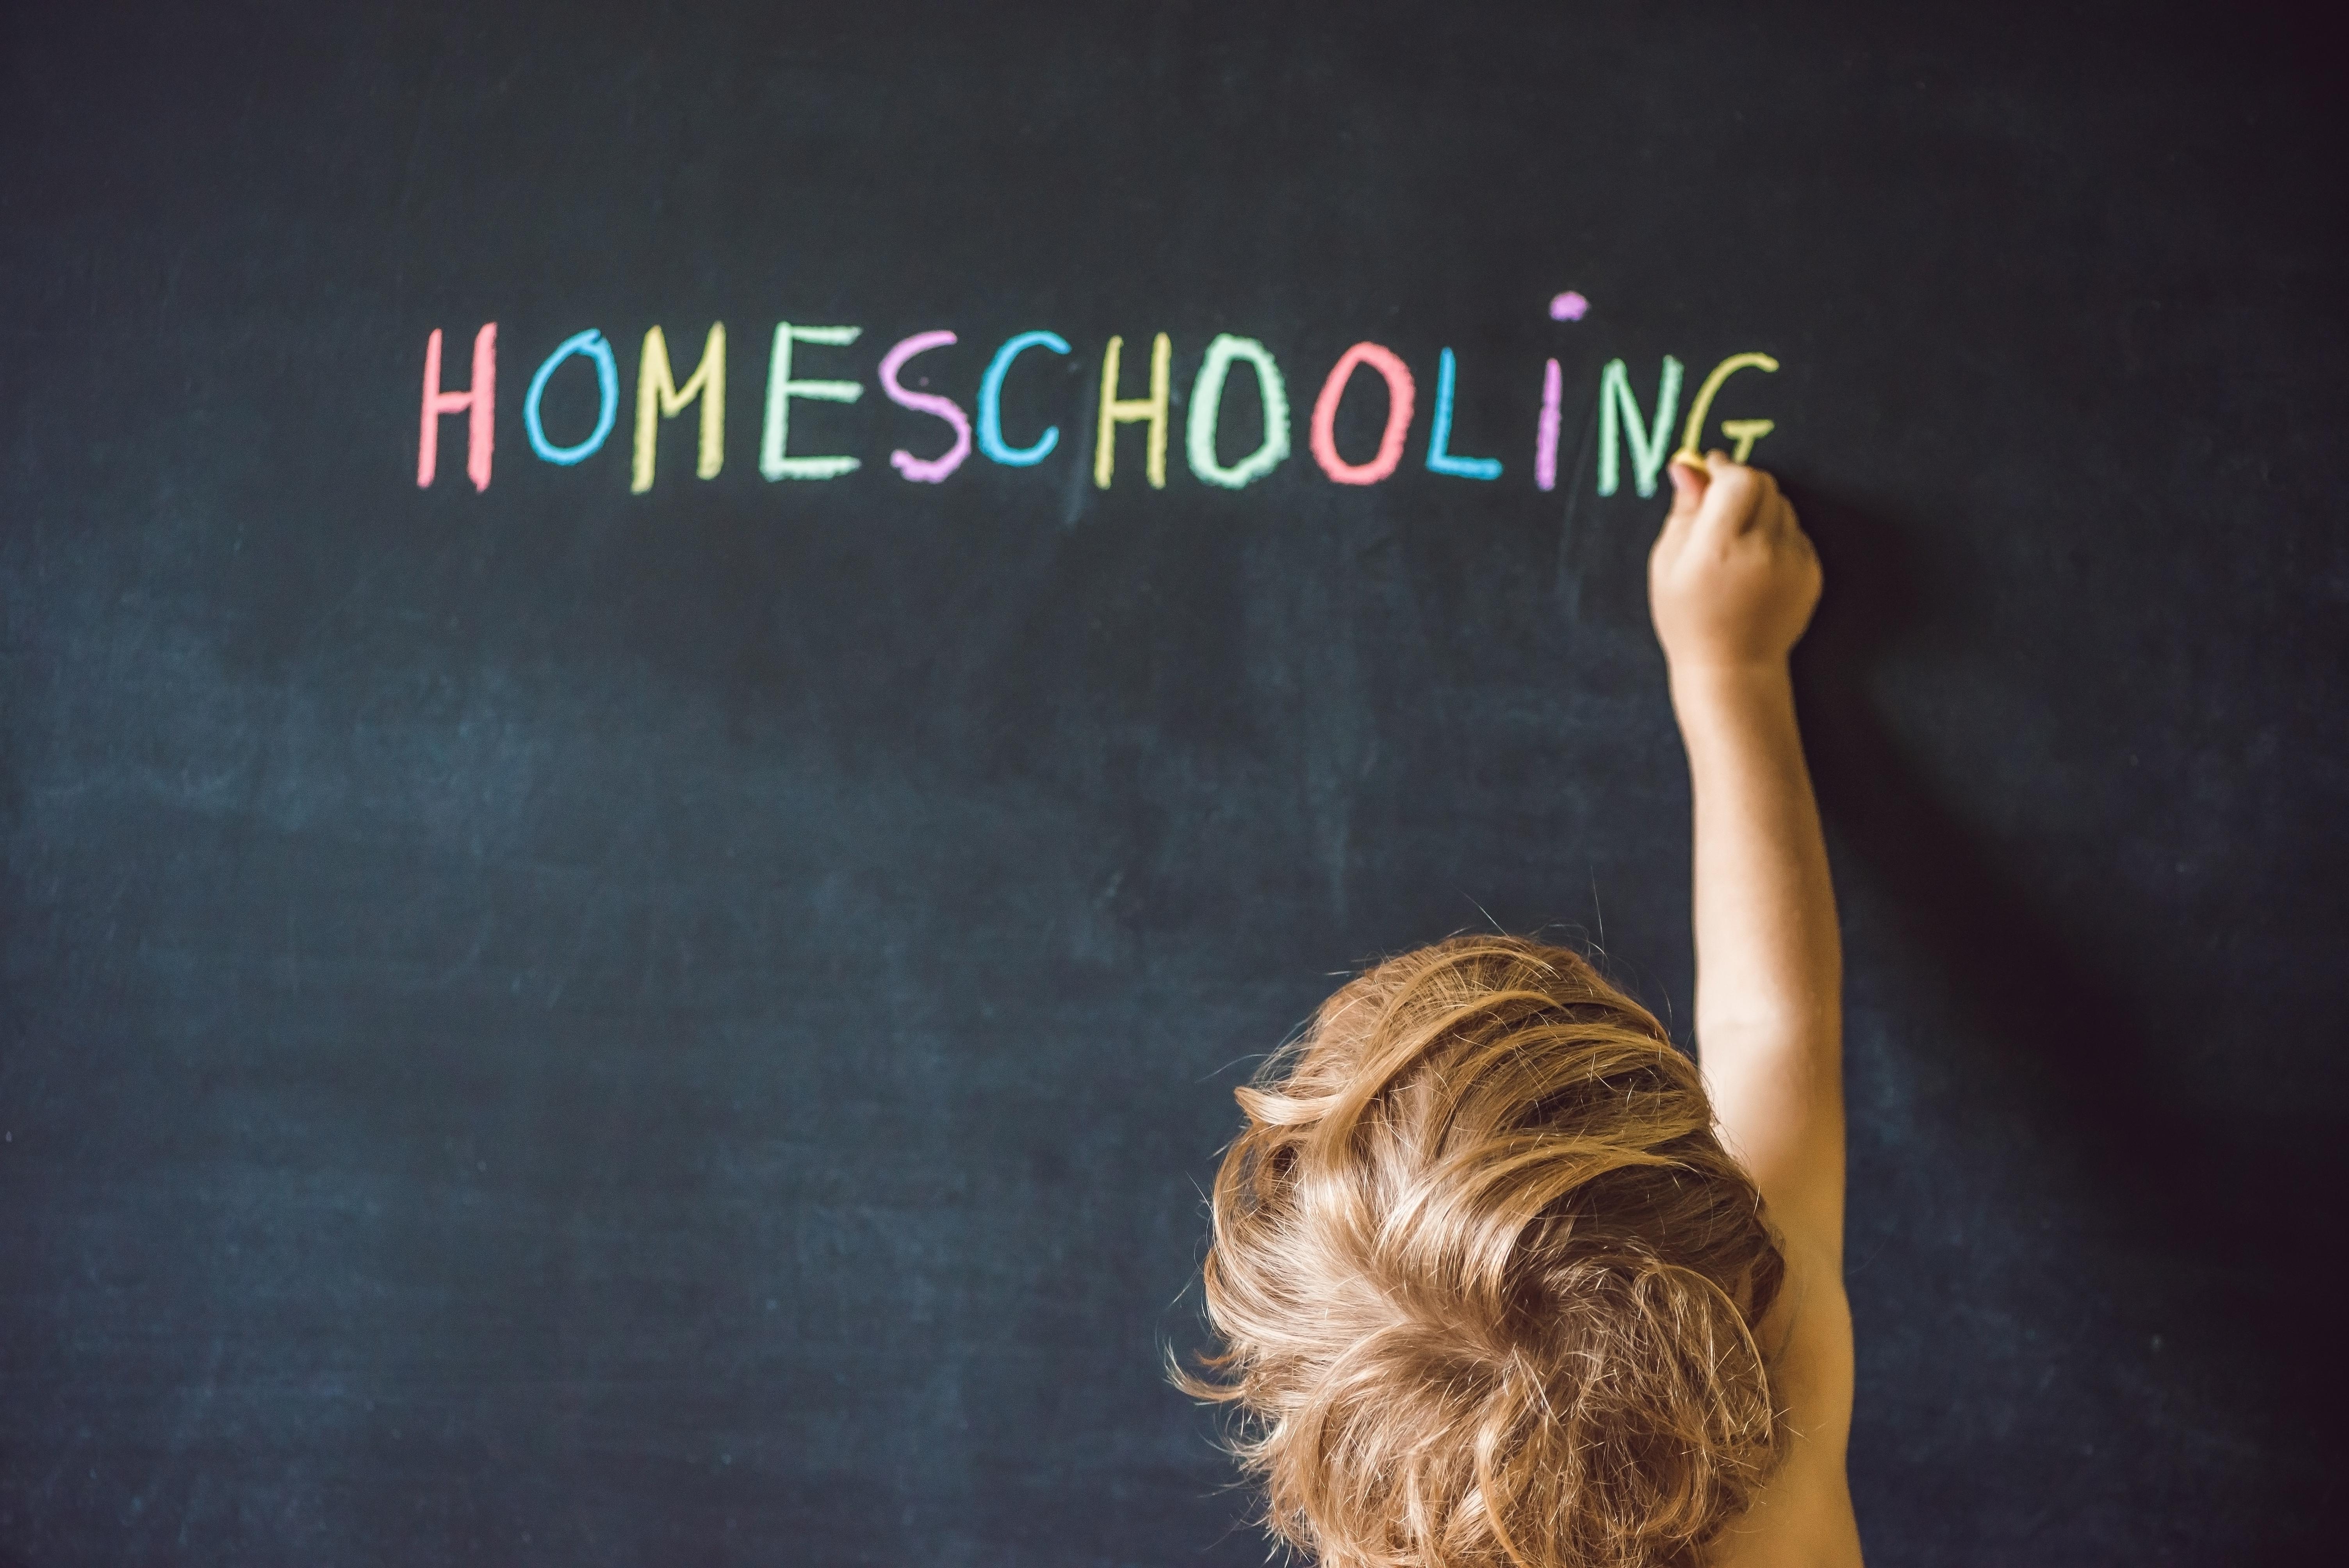 Homeschool Days - Ohio's Ancient People